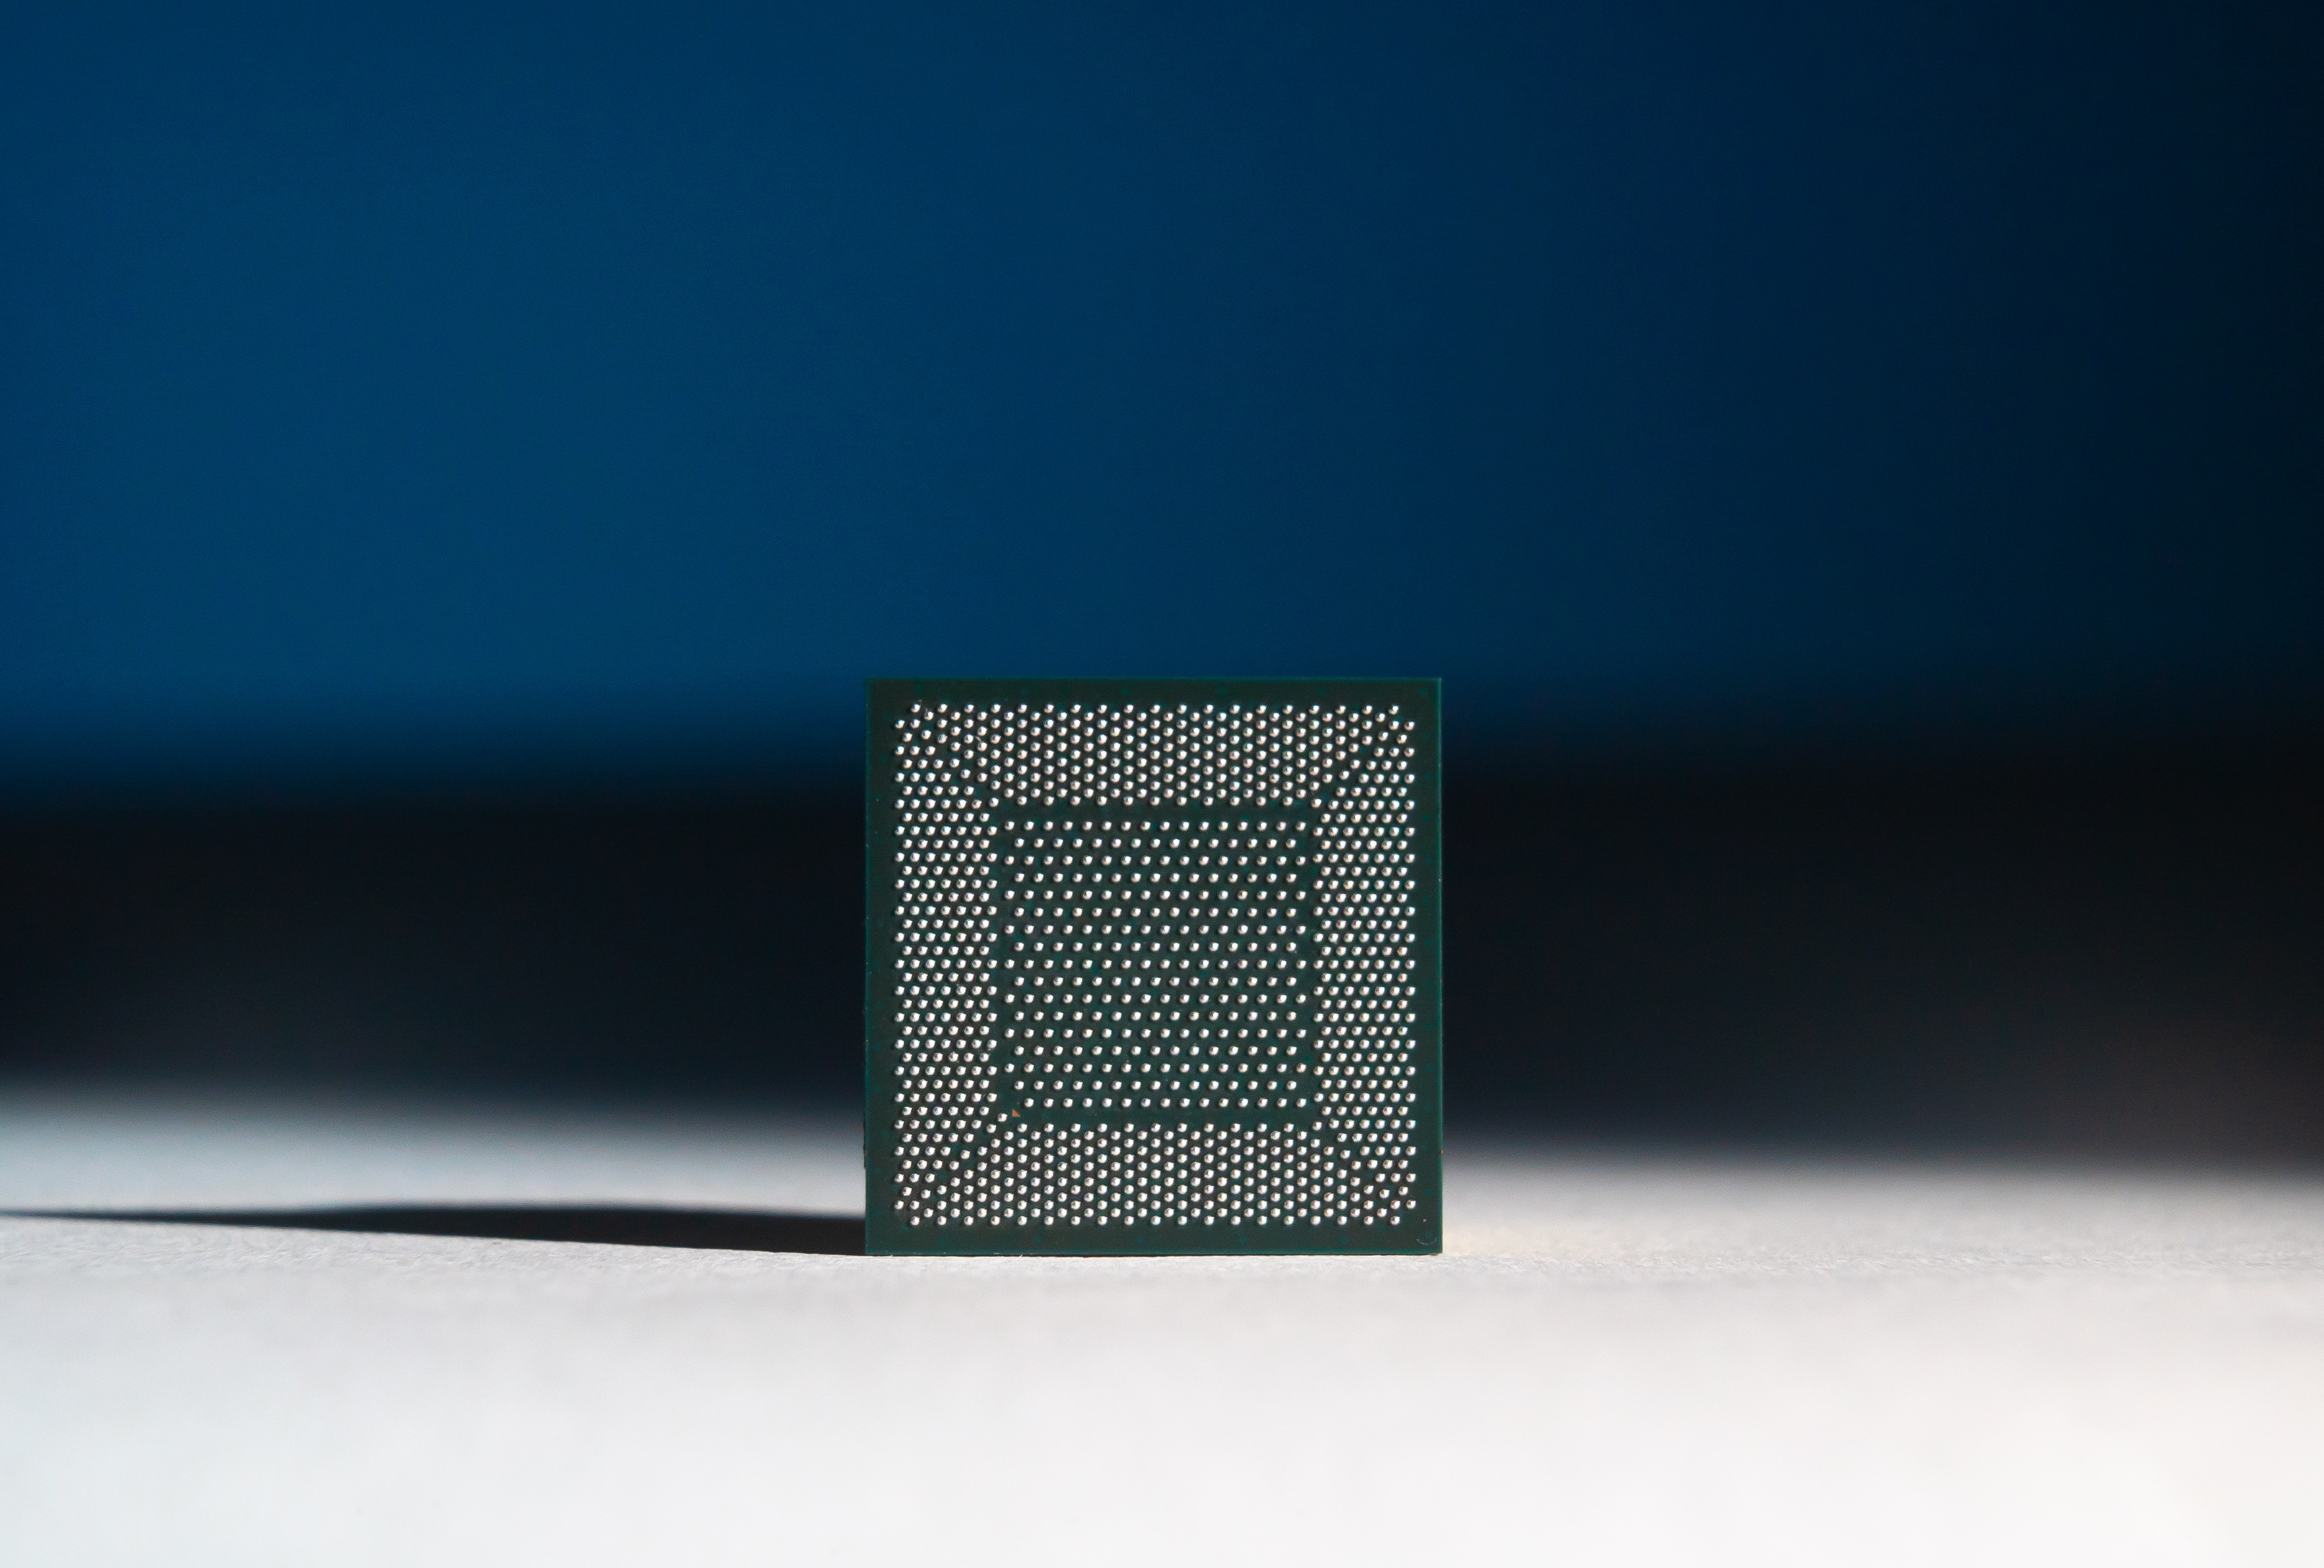 Intel-Neuromorphic-system-1